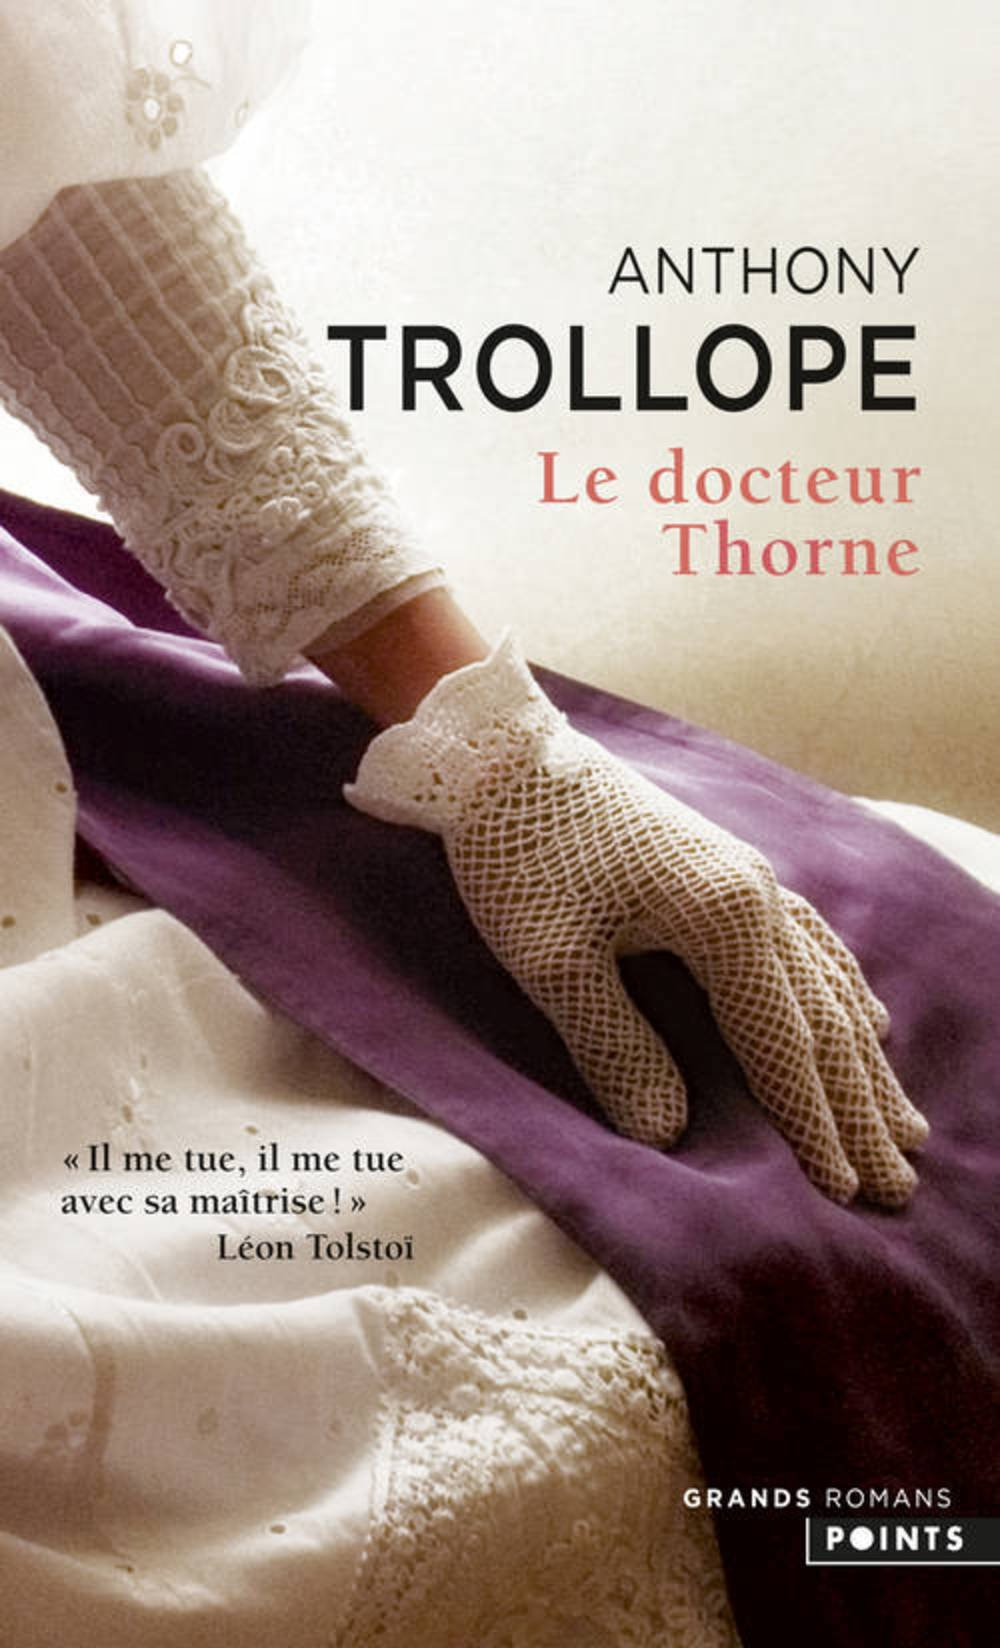 Docteur Thorne d'Anthony Trollope - Page 2 71n9JvKP-9L